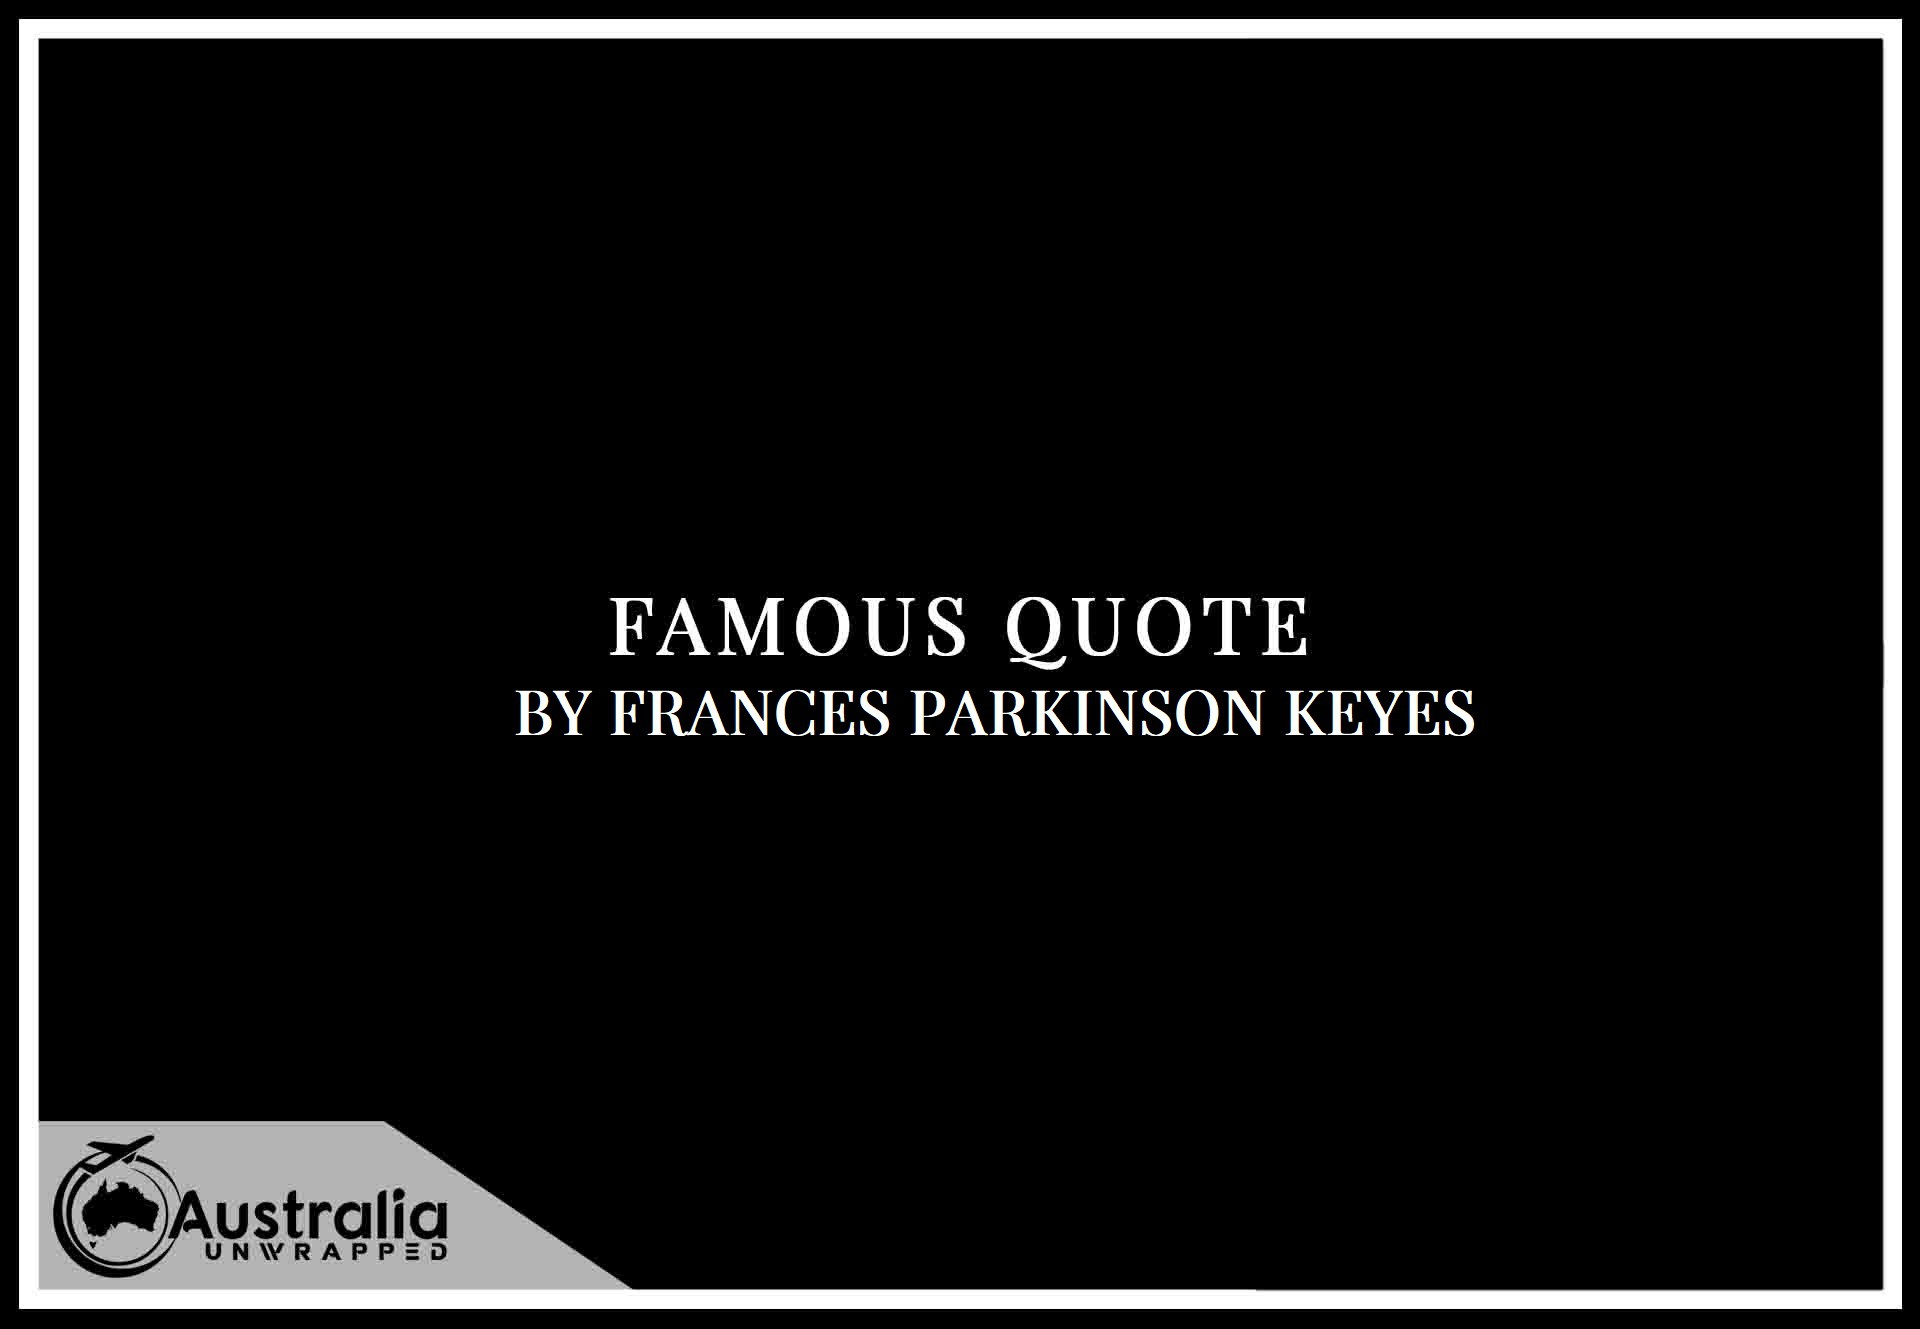 Top 1 Famous Quotes by Author Frances Parkinson Keyes